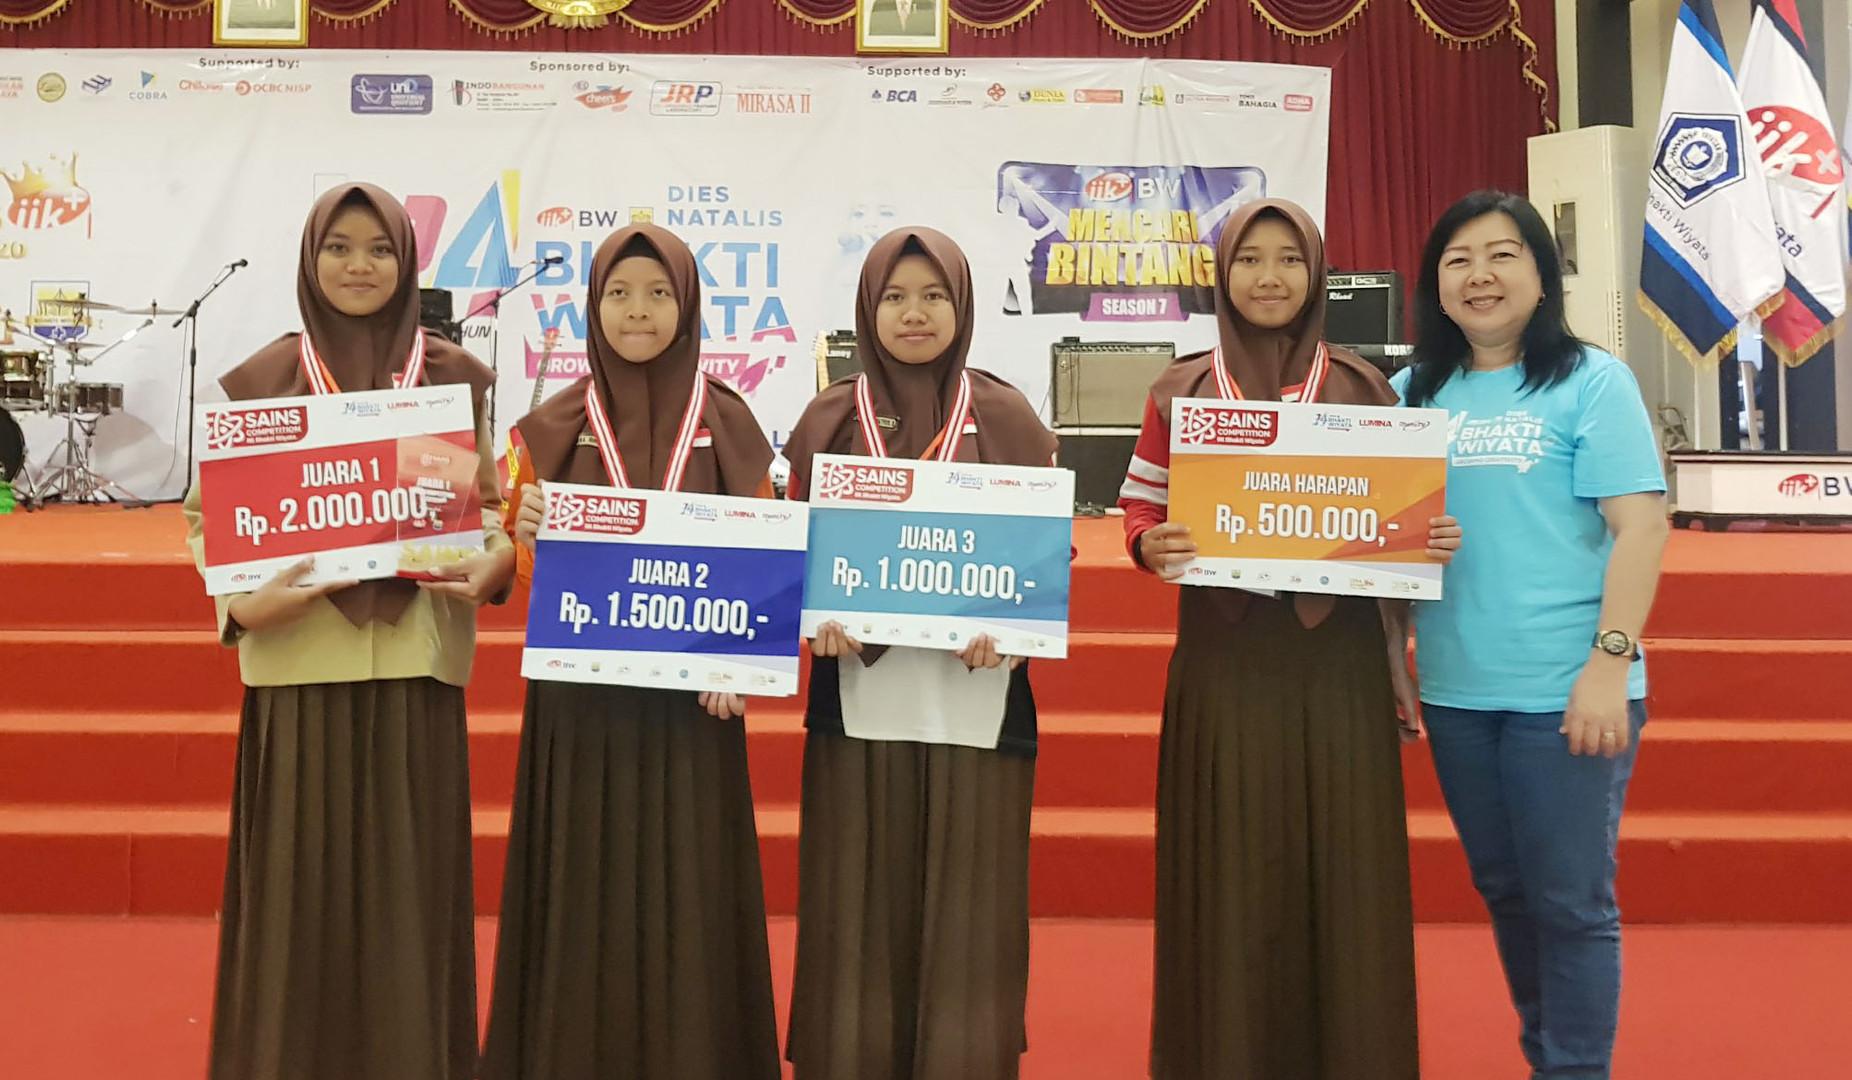 Juara Sains Competition 2019